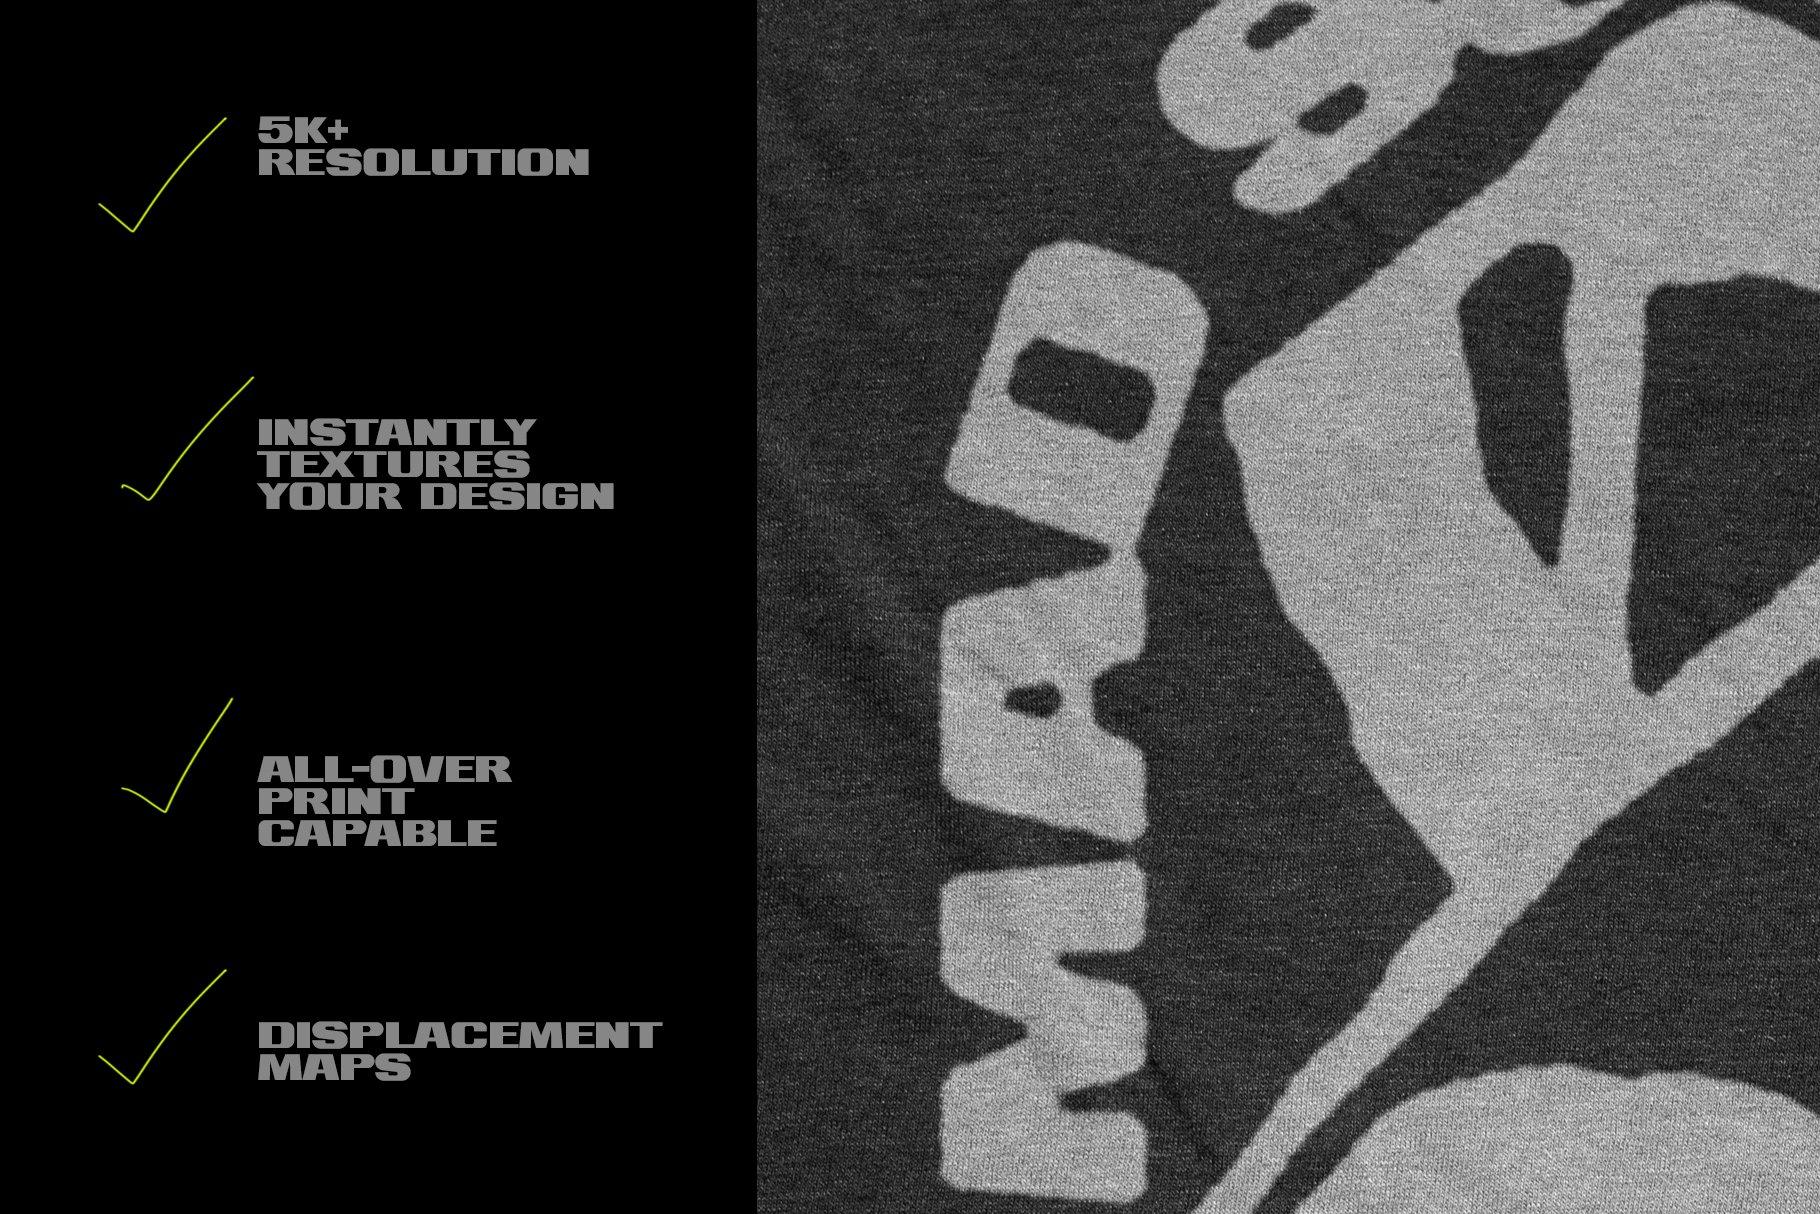 做旧复古长袖T恤印花图案设计PS贴图样机模板 Vintage Long Sleeve T-Shirt Mockup插图3